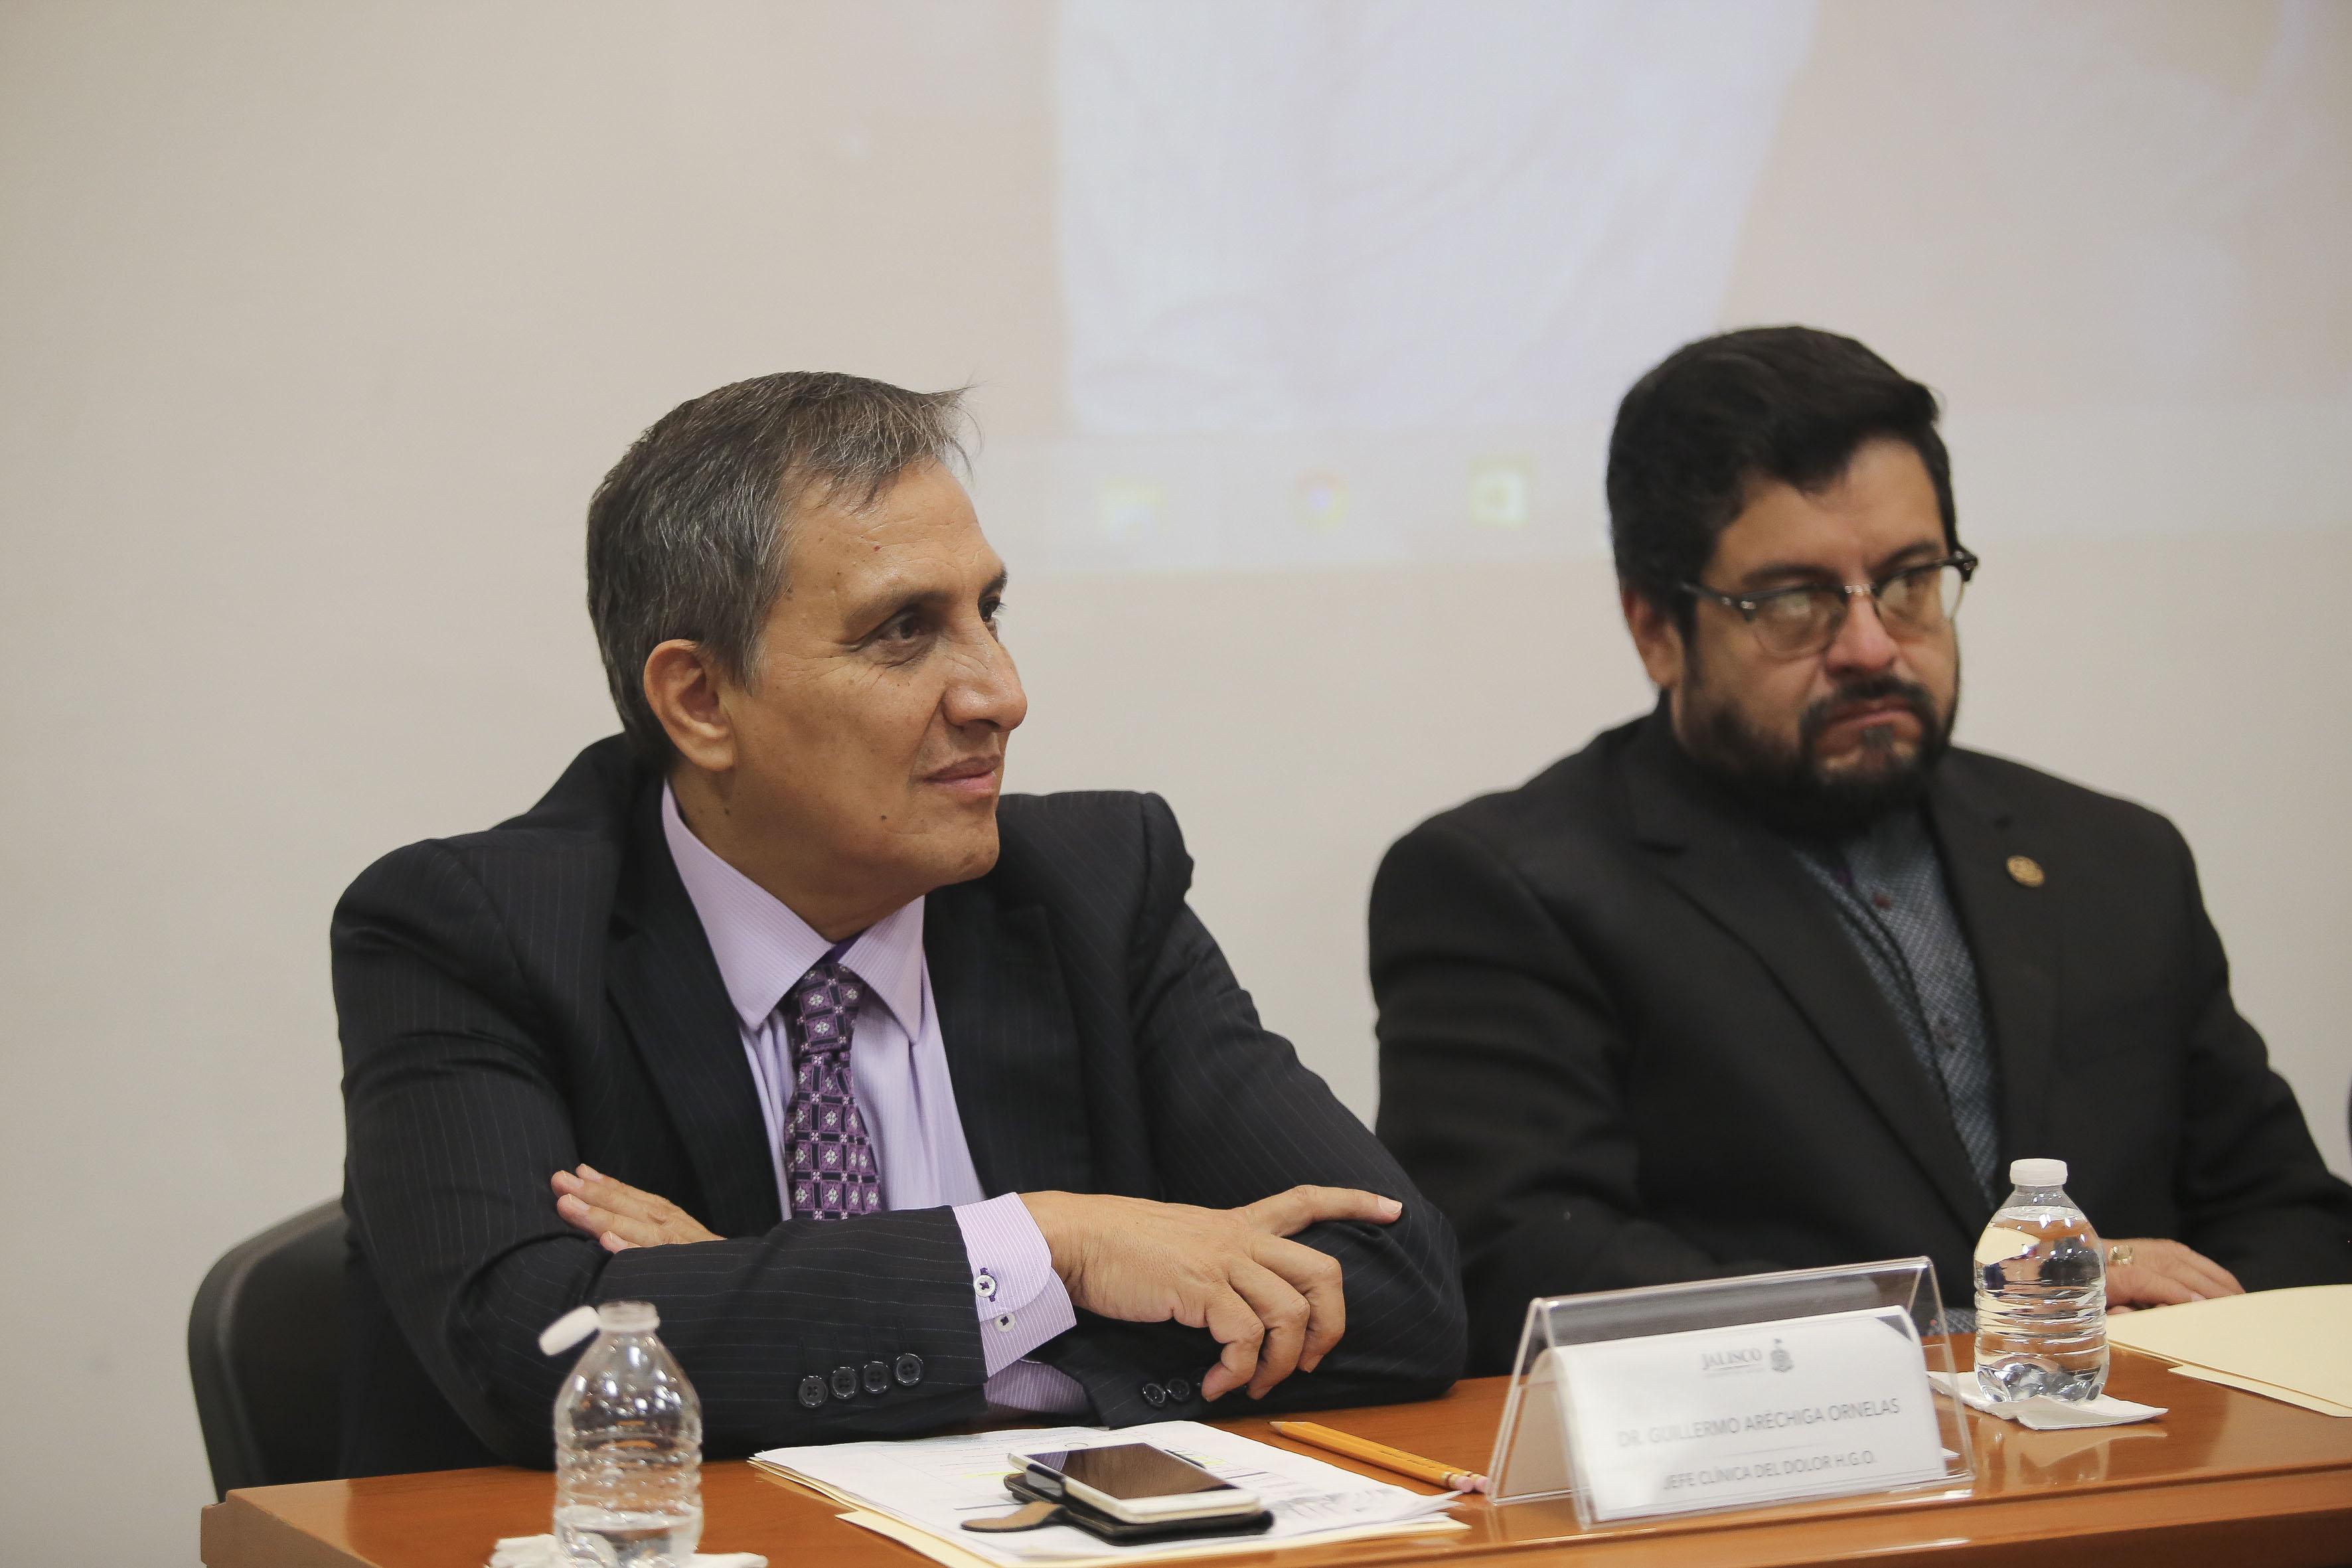 Dr Guillermo Aréchiga Ornelas, haciendo uso de la palabra